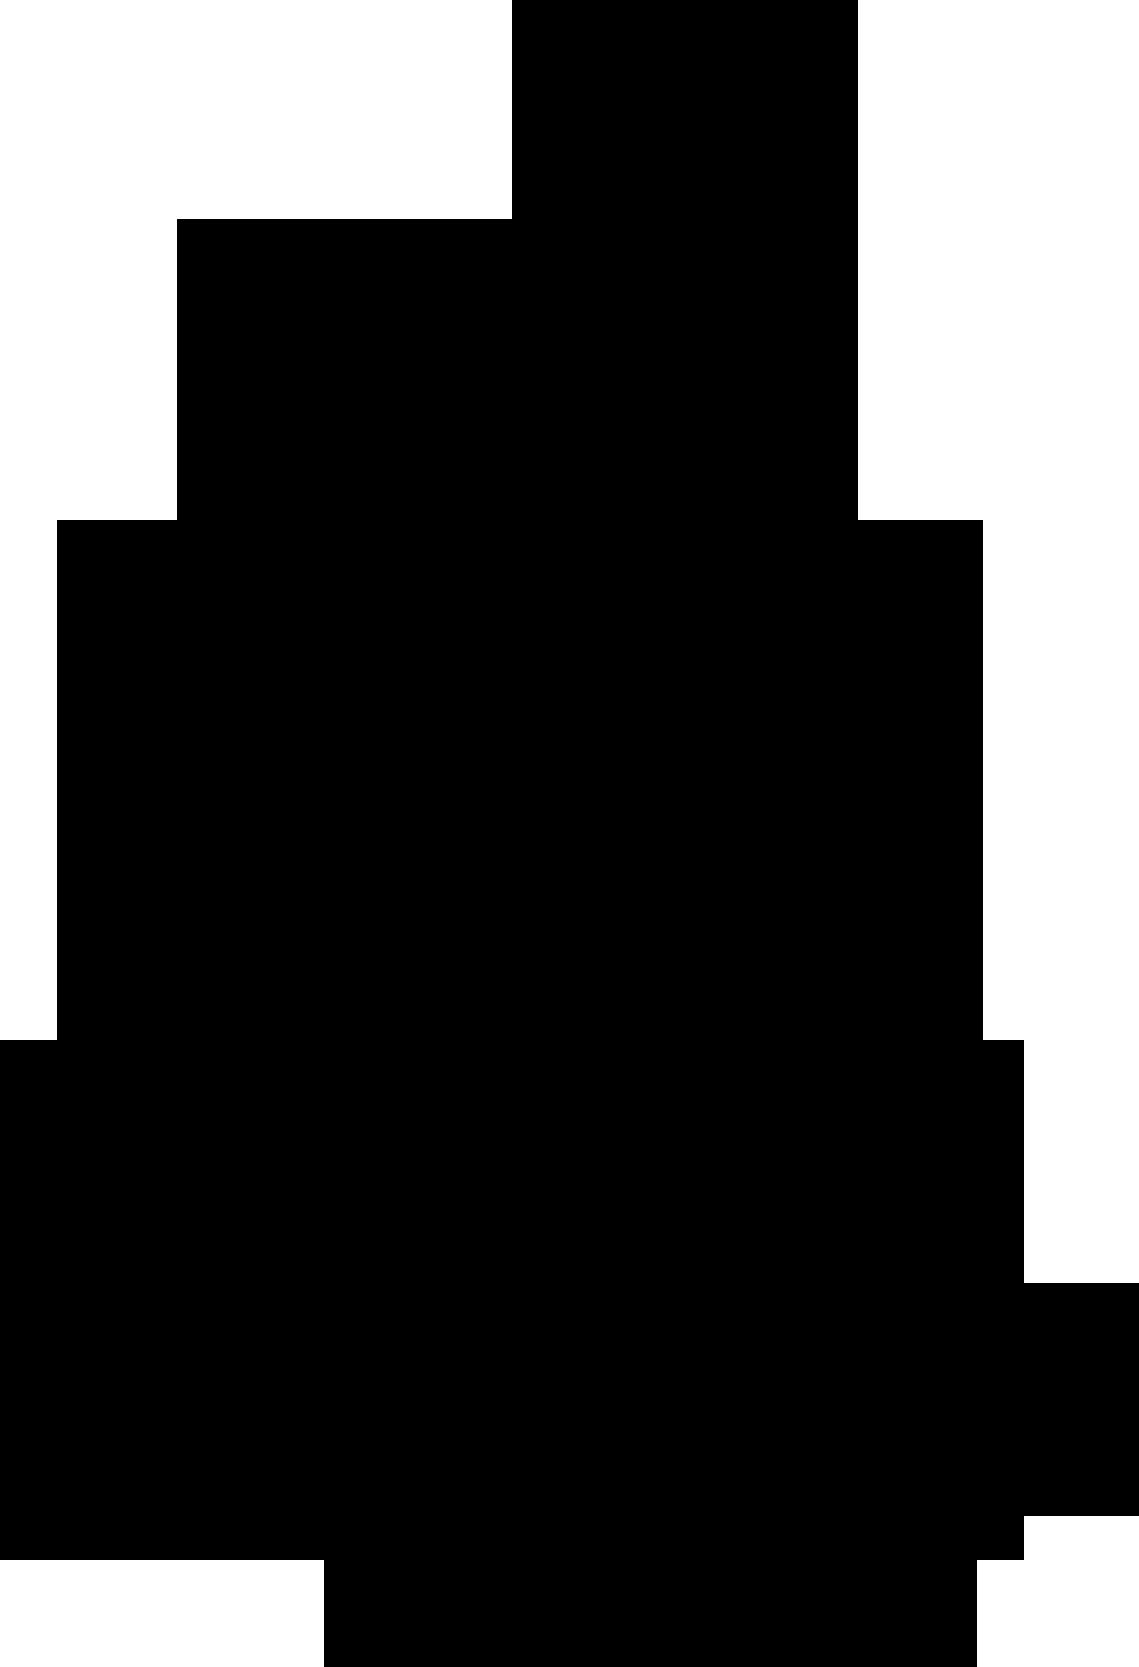 черно белые картинки узоры фигуры